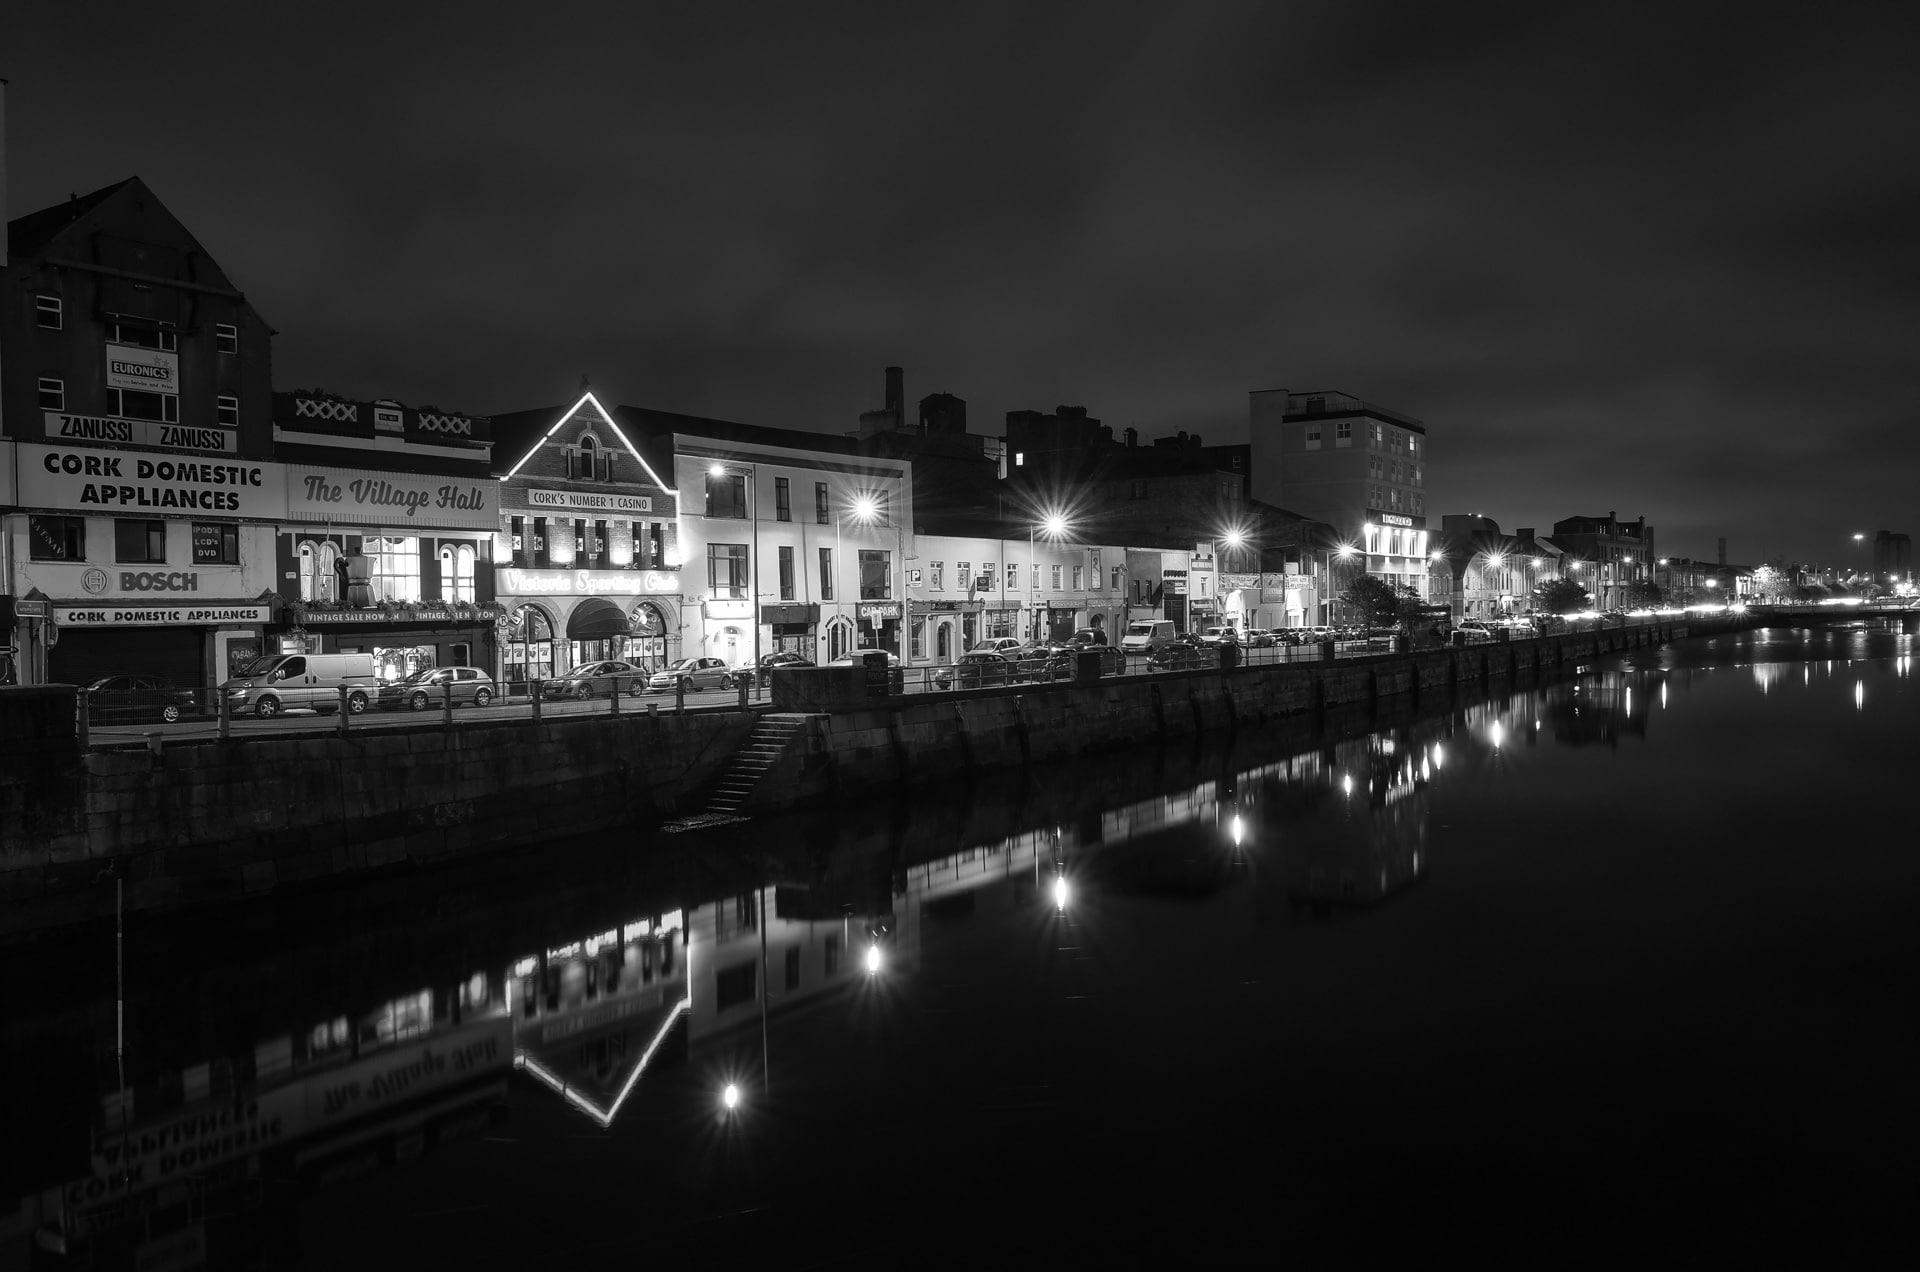 Urban Story : A Night in Cork